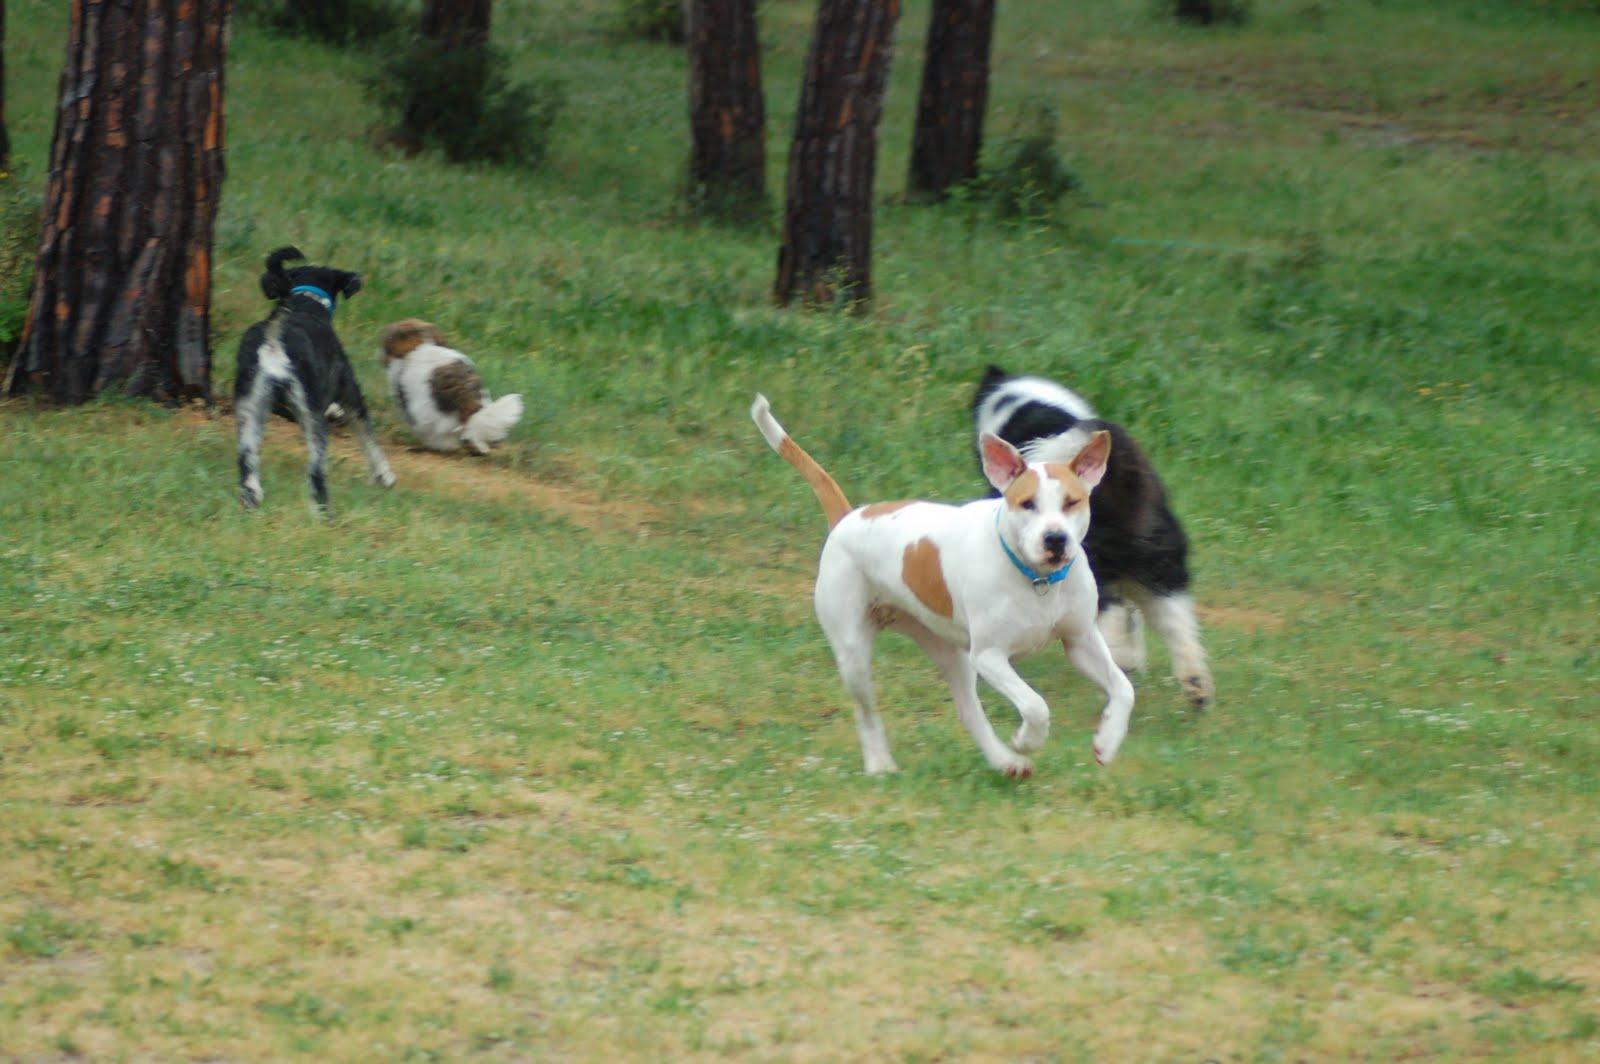 Coqui vega terapeuta natural y educador canino semana - El tiempo en vidreres ...